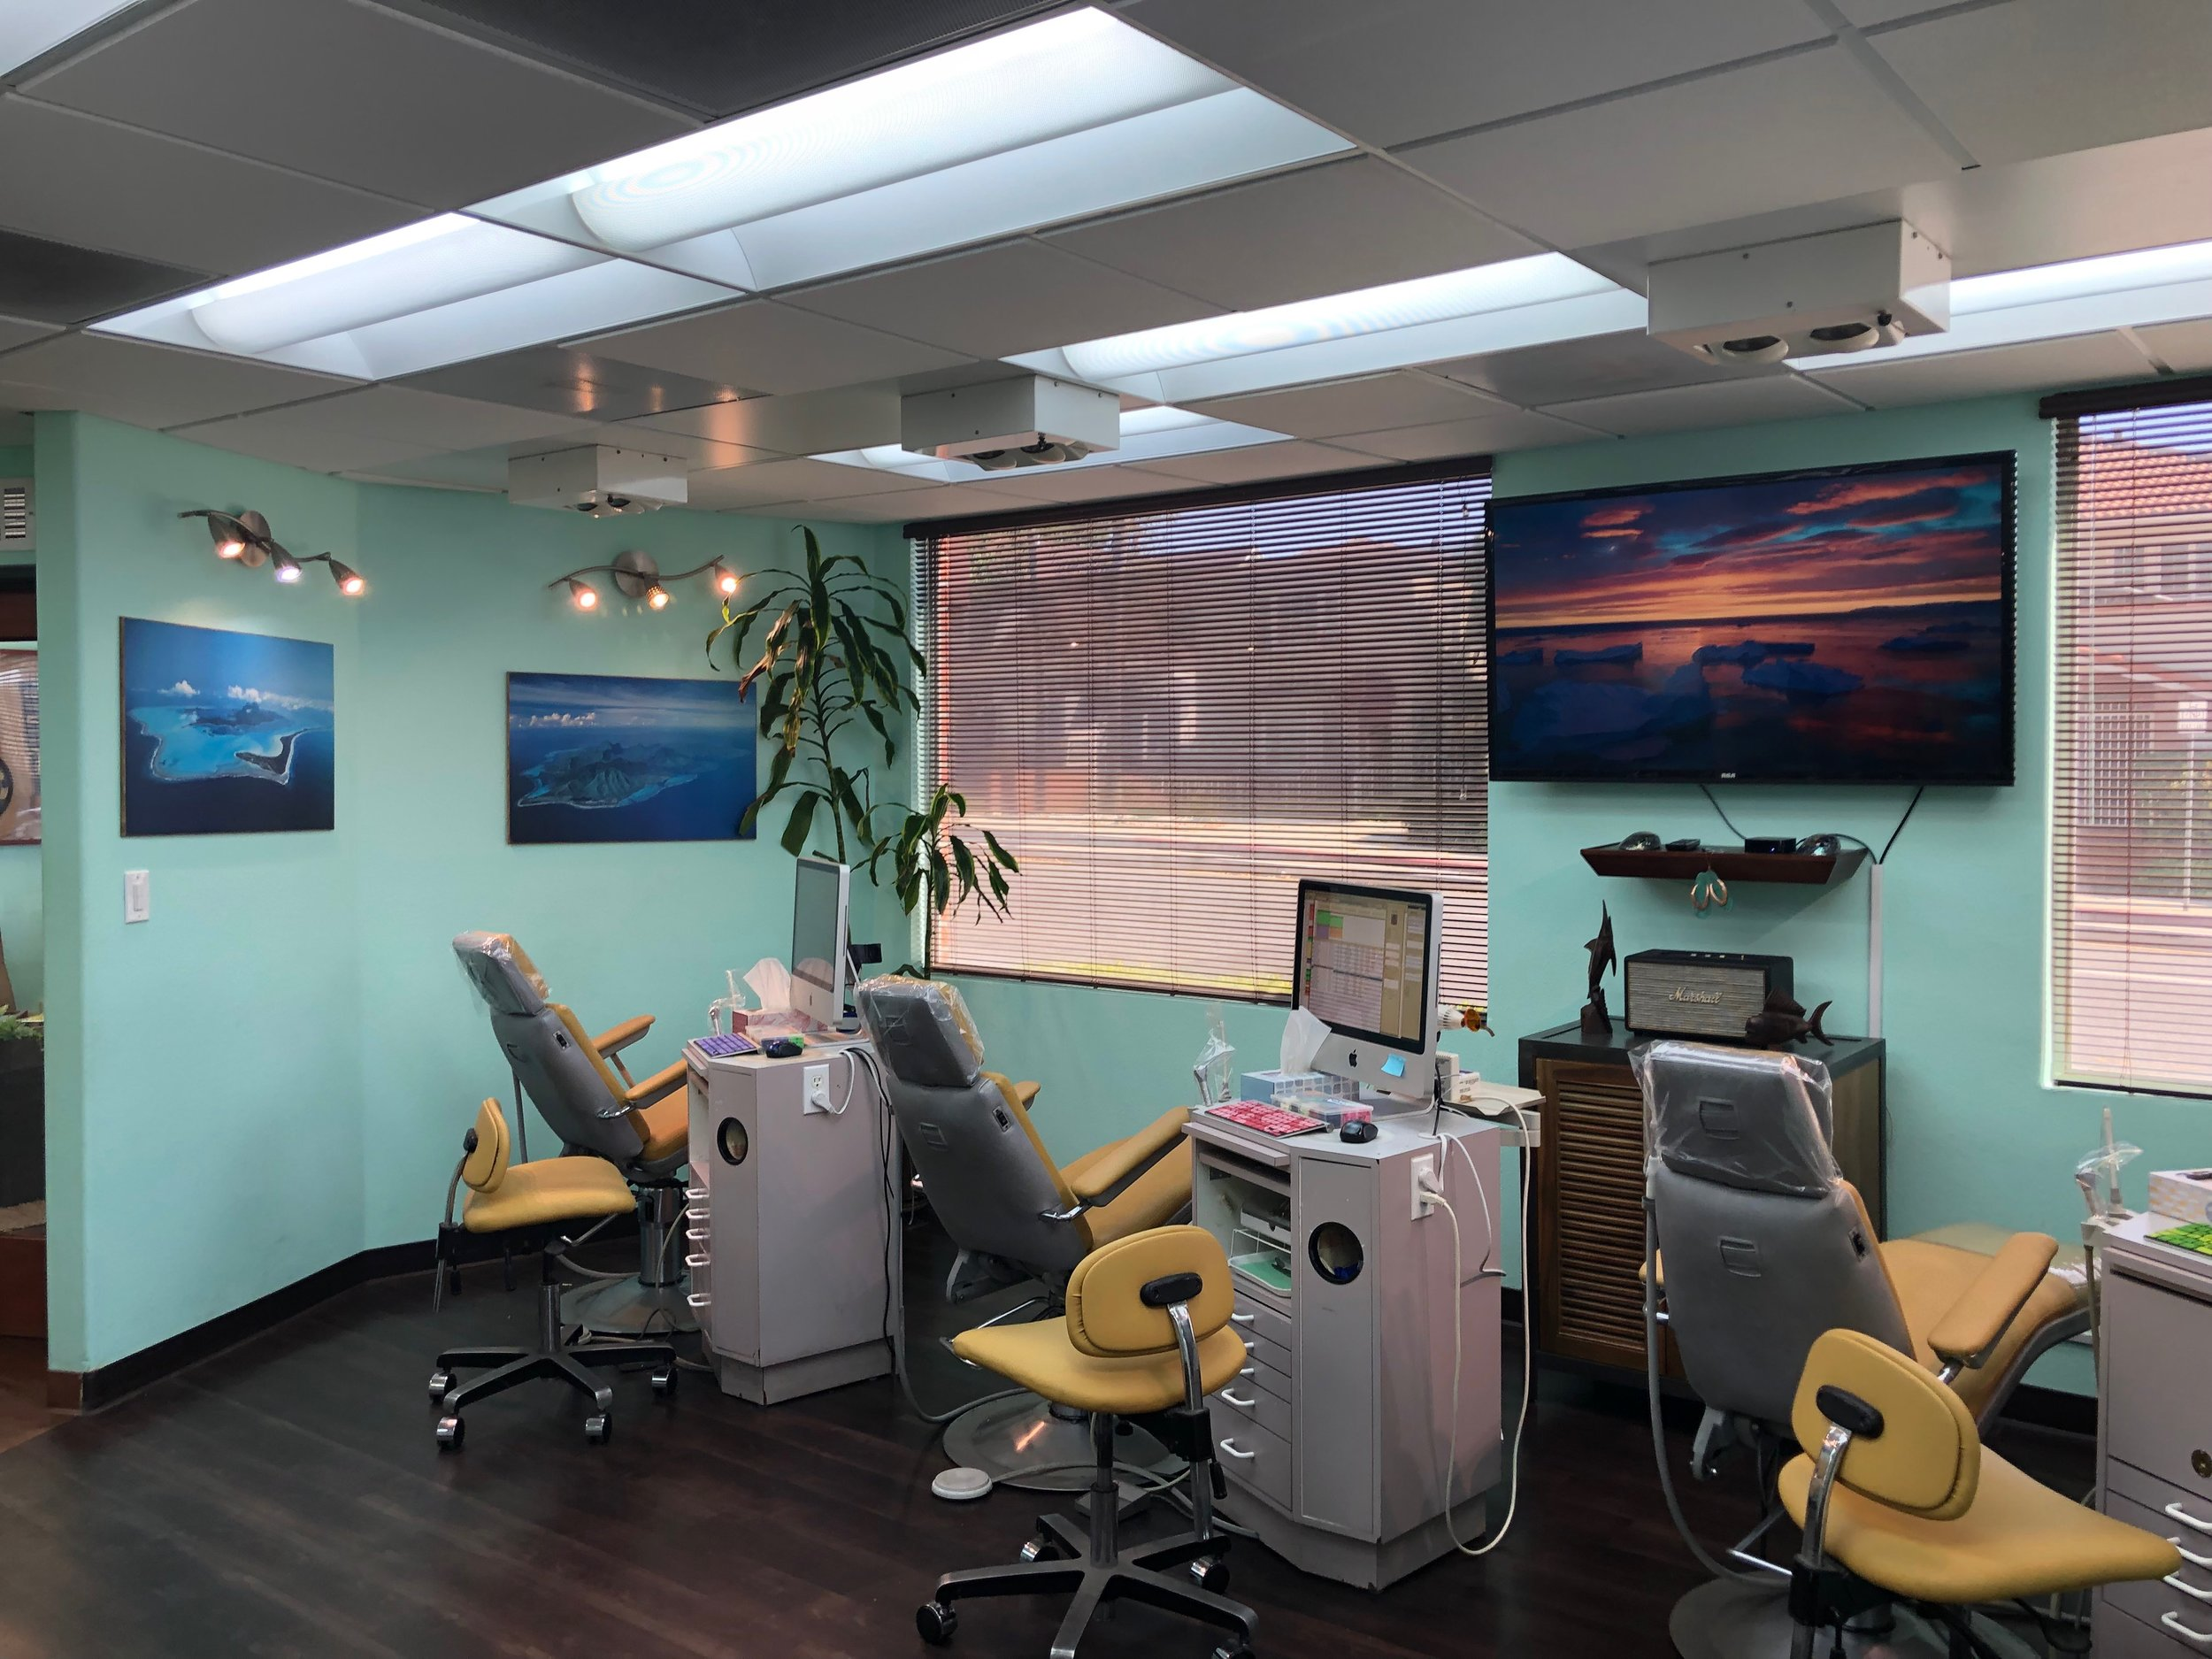 Clinical Treatment Area